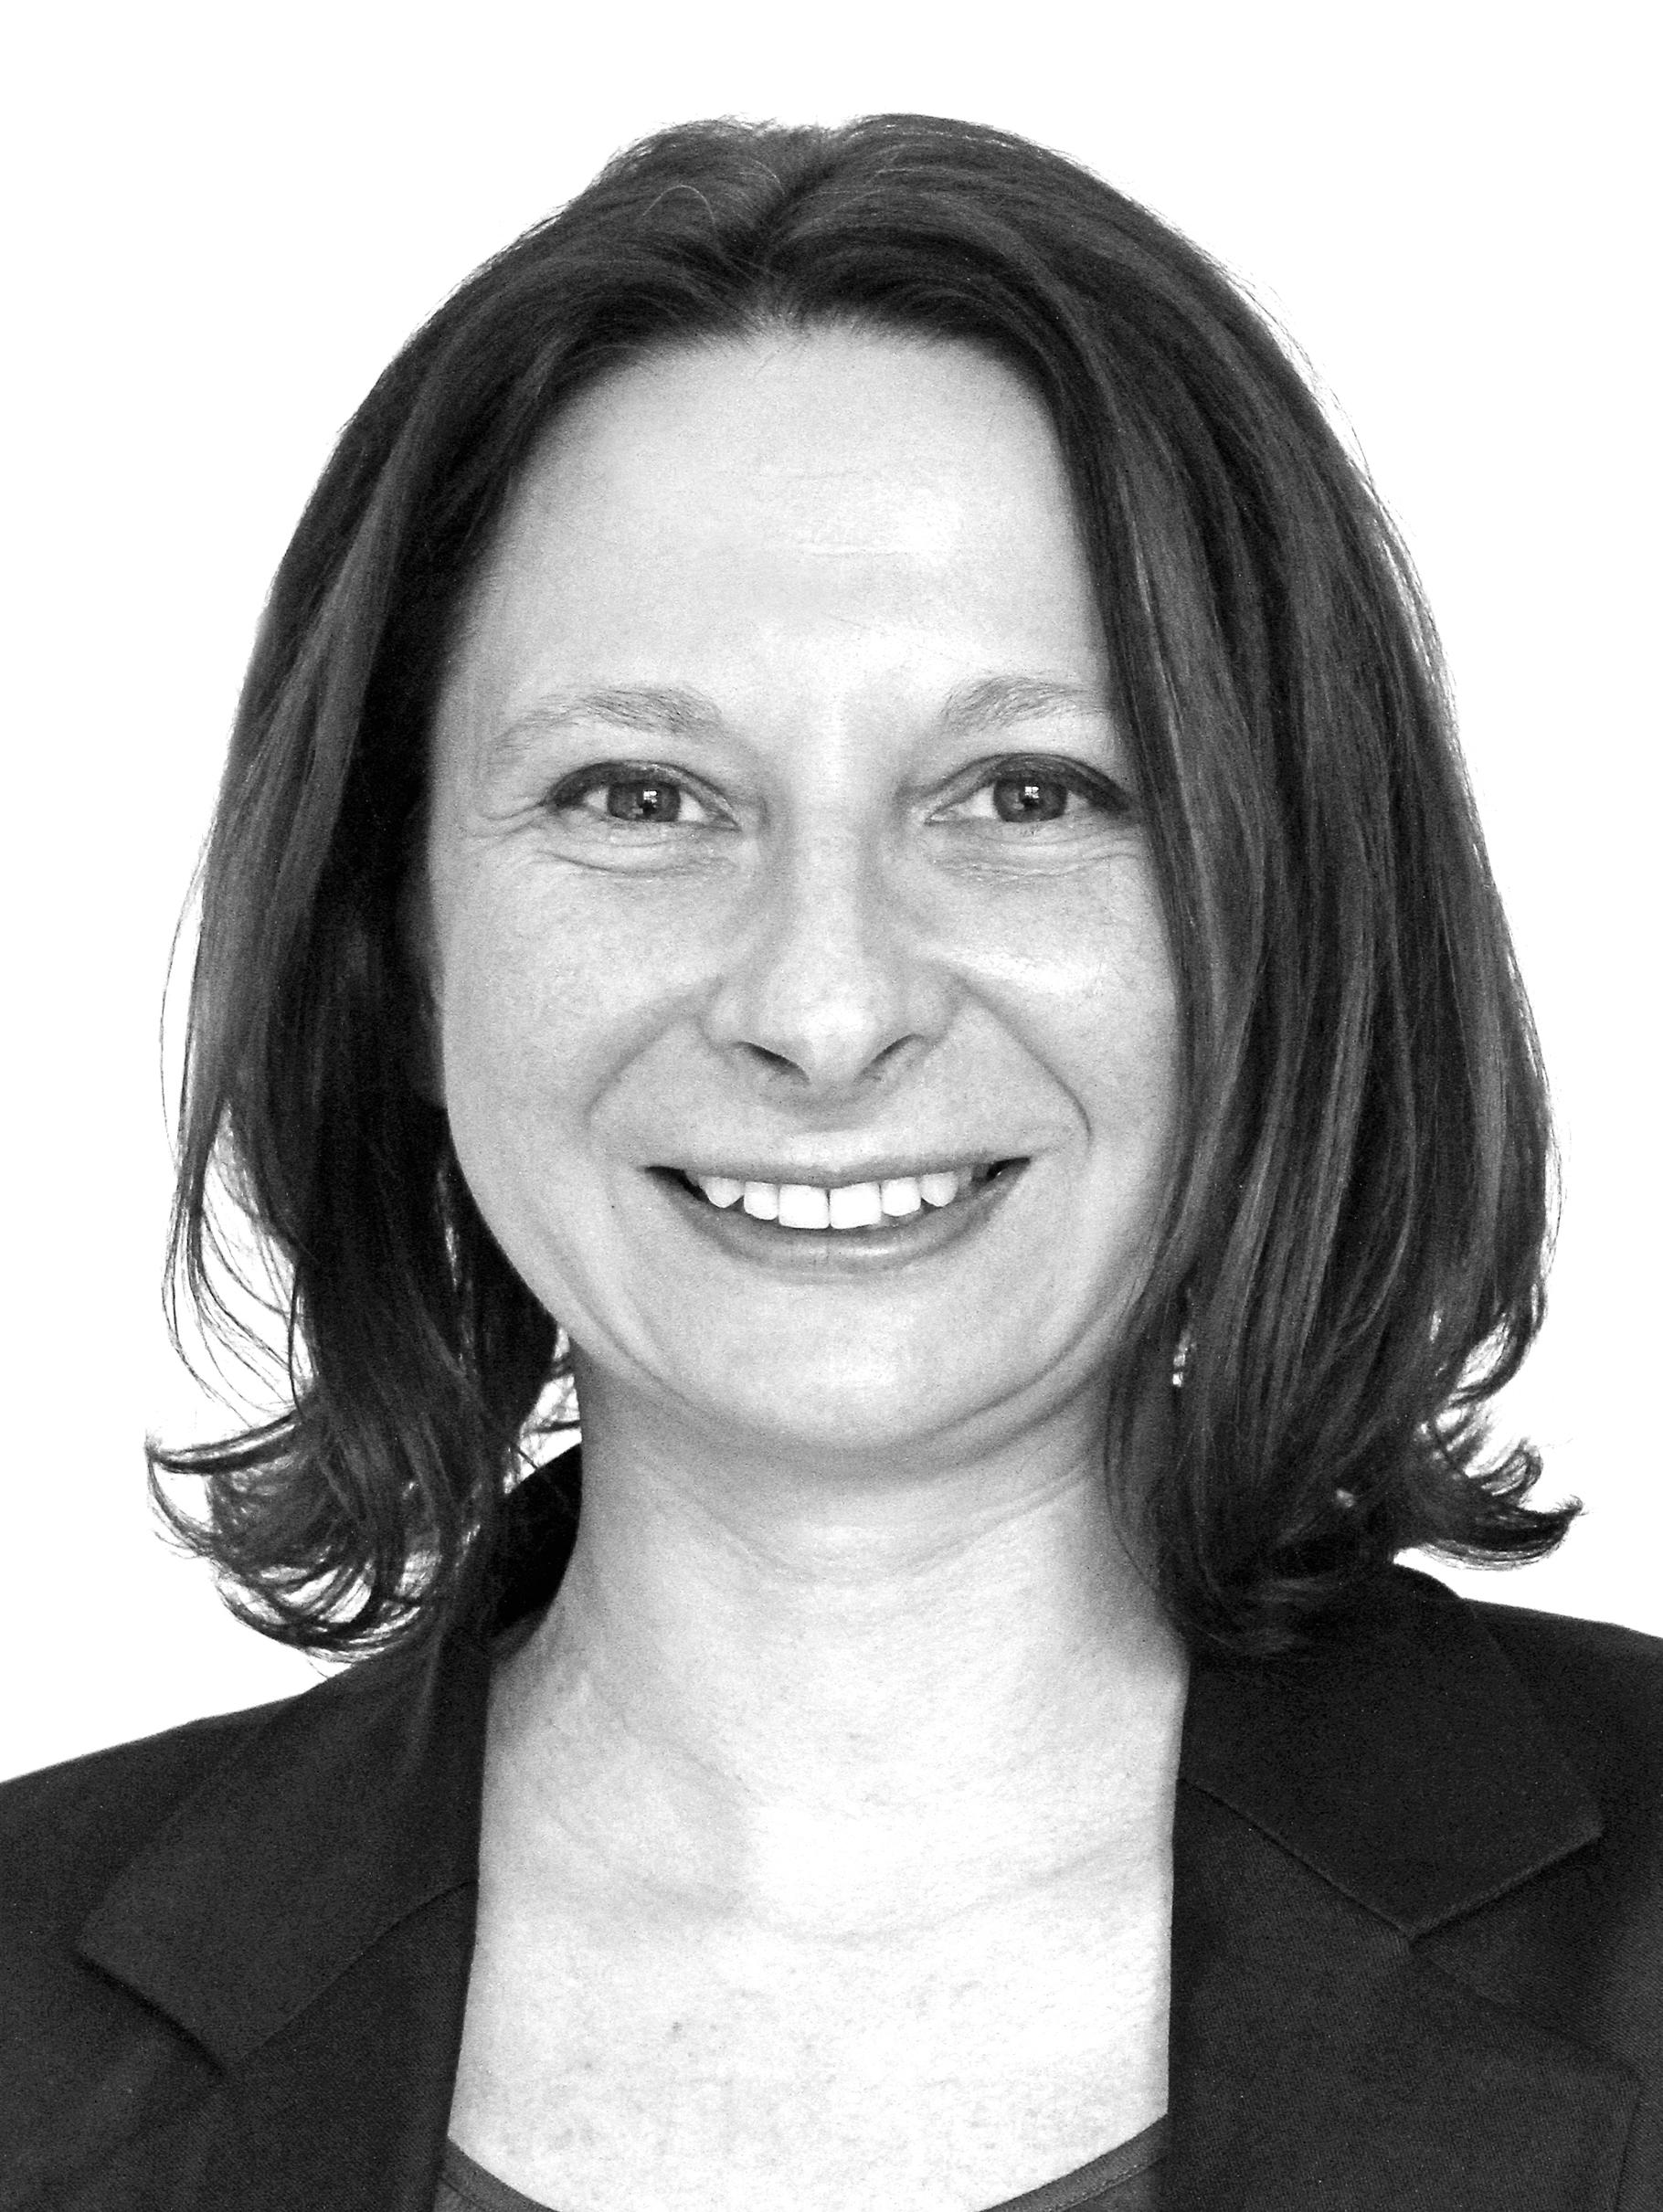 Katja Tomczak